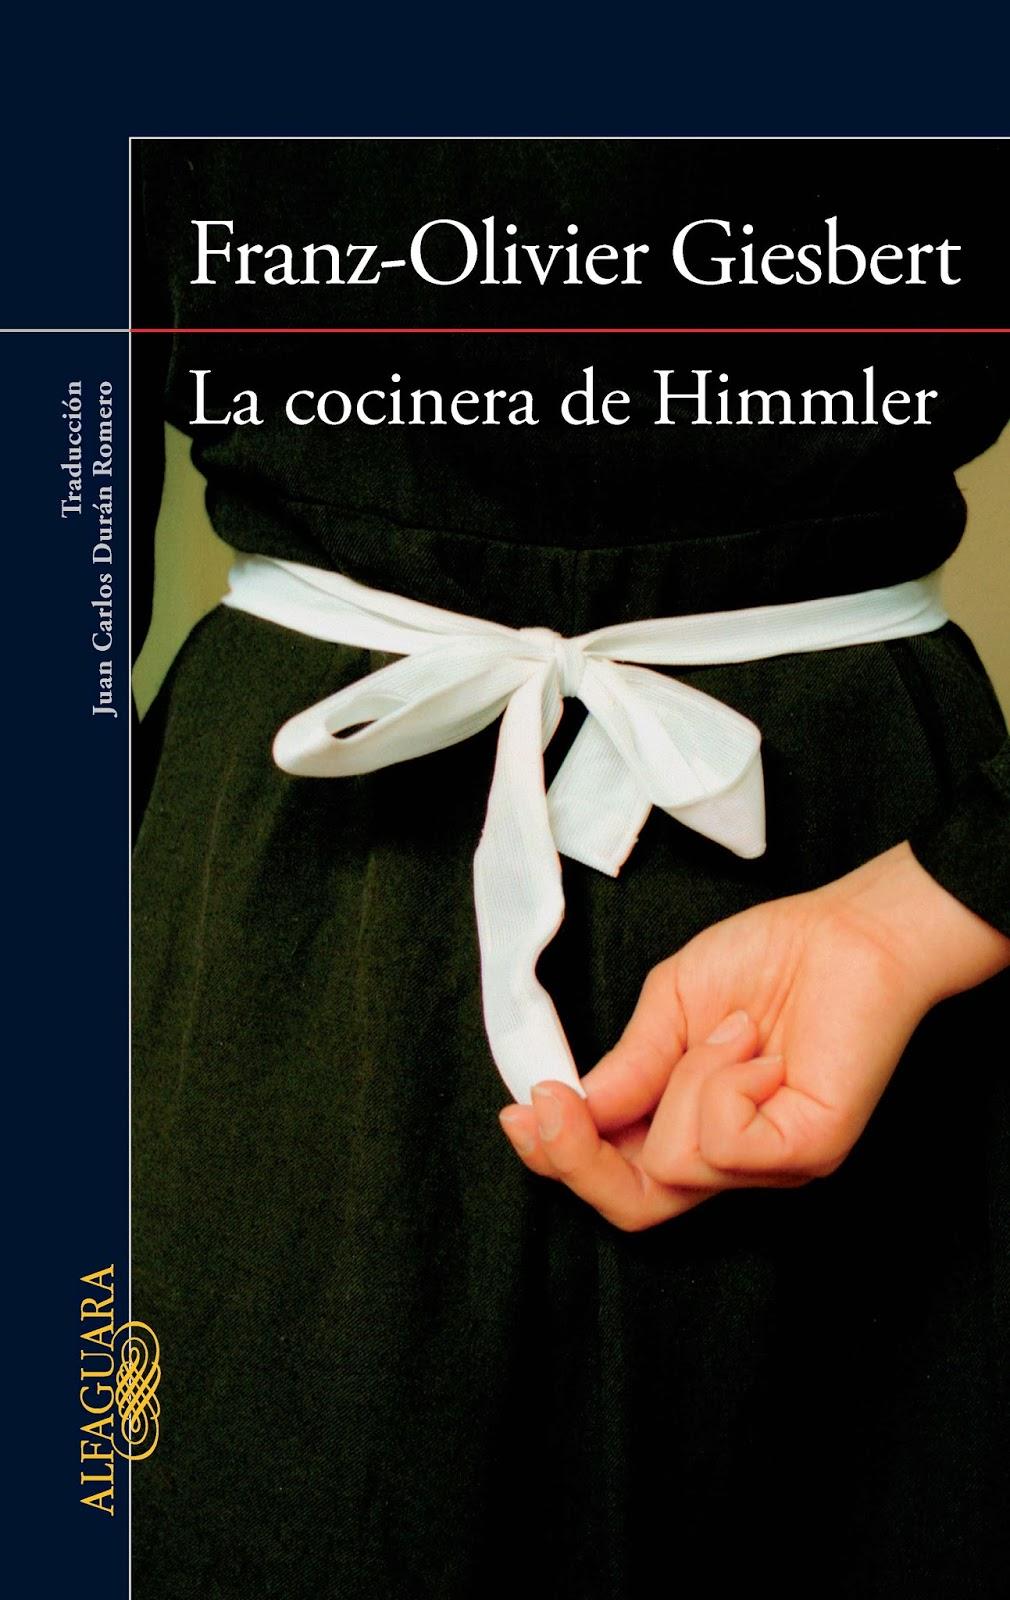 Franz-Olivier Giesbert, La cocinera de Himmler LA%2BCOCINERA%2BDE%2BHIMMLER